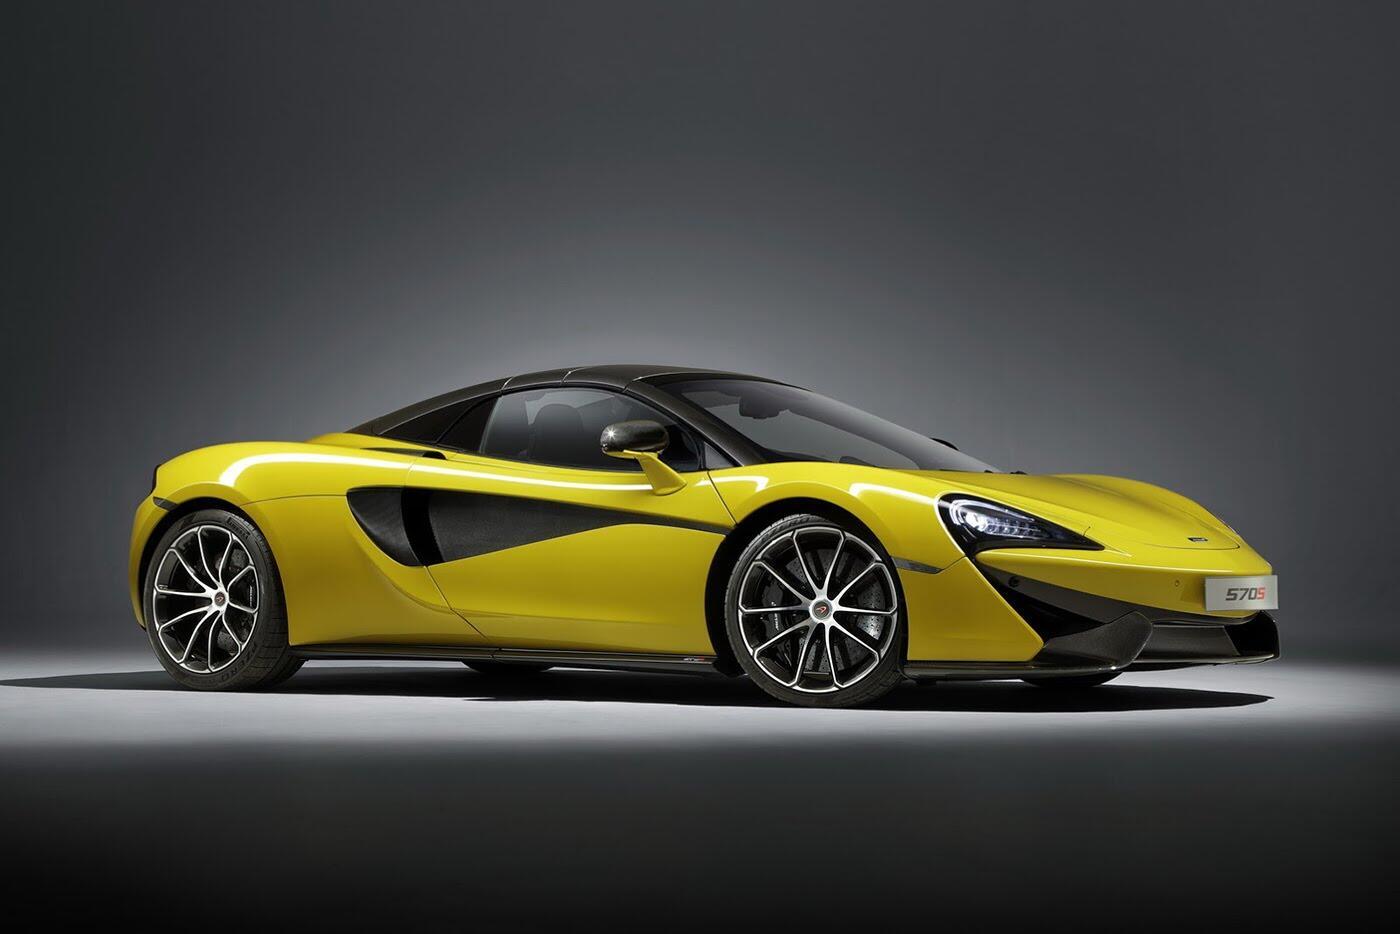 Siêu xe McLaren 570S Spider sắp ra mắt - Hình 8